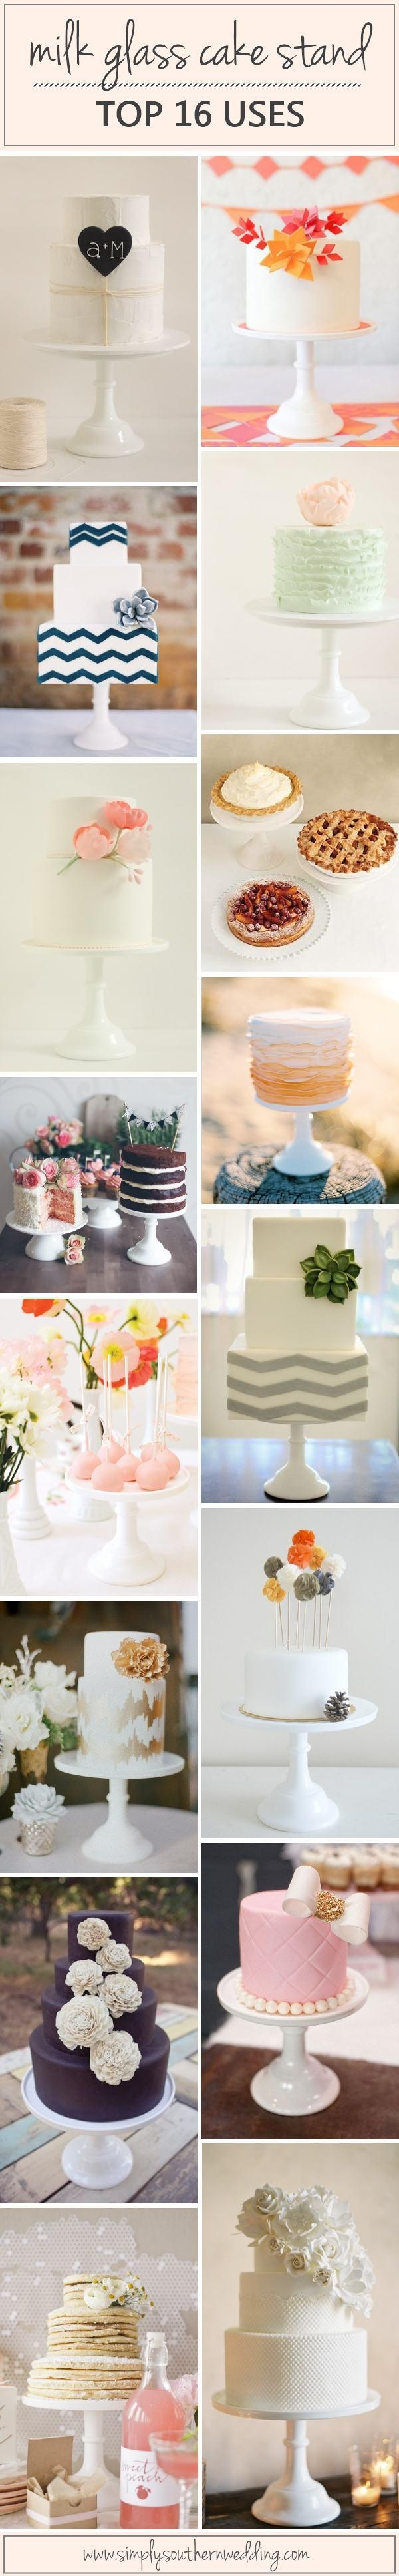 Classic Milk Glass Cake Stand - Top 16 Uses! | Shop SimplySouthernWedding.com